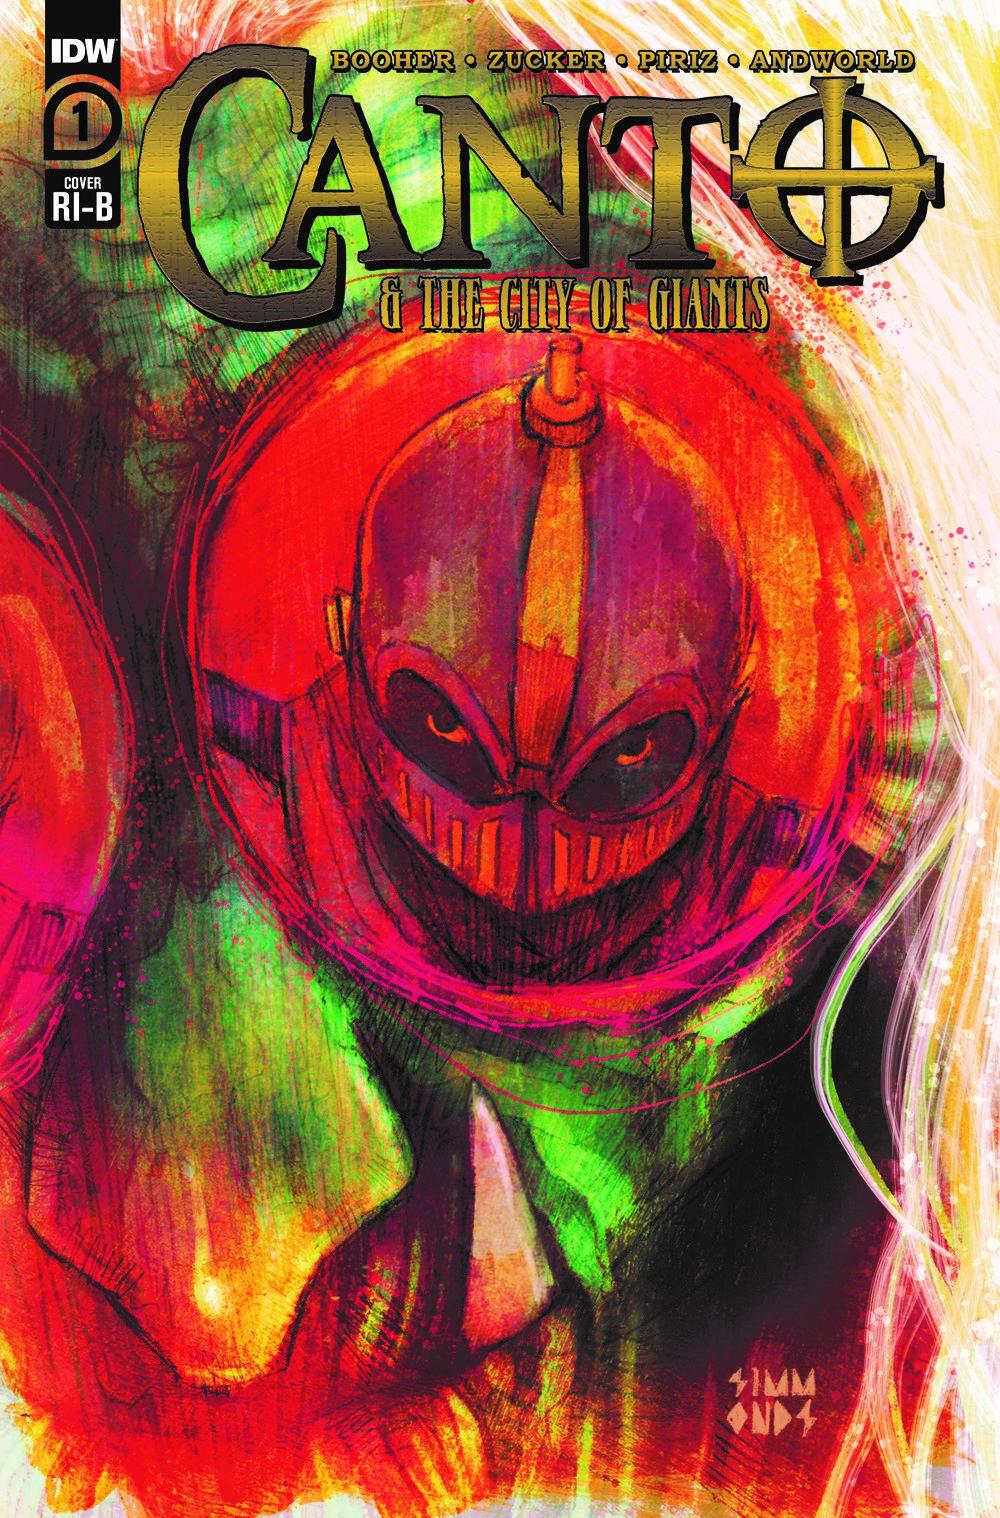 Canto-CoG01_cvrRI-B ComicList: IDW Publishing New Releases for 04/14/2021